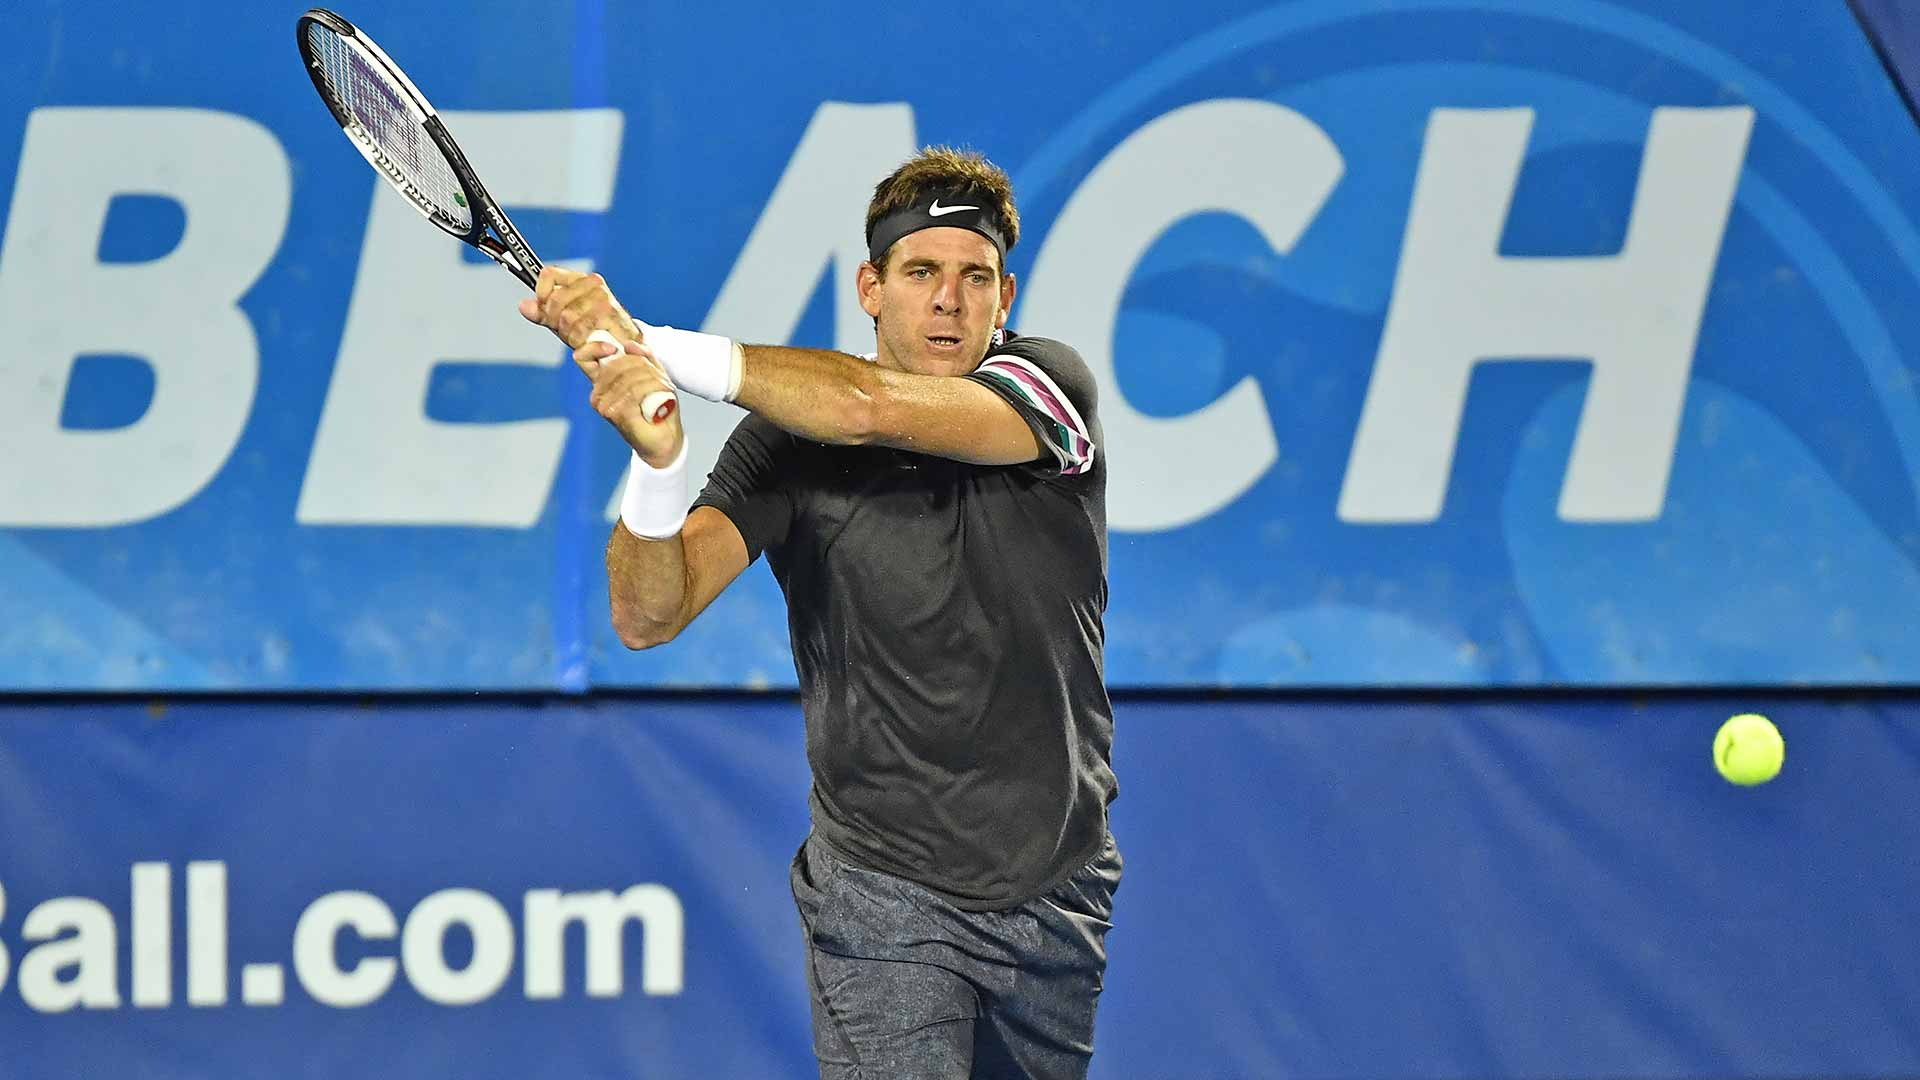 Official Site Of Men S Professional Tennis Atp Tour Tennis